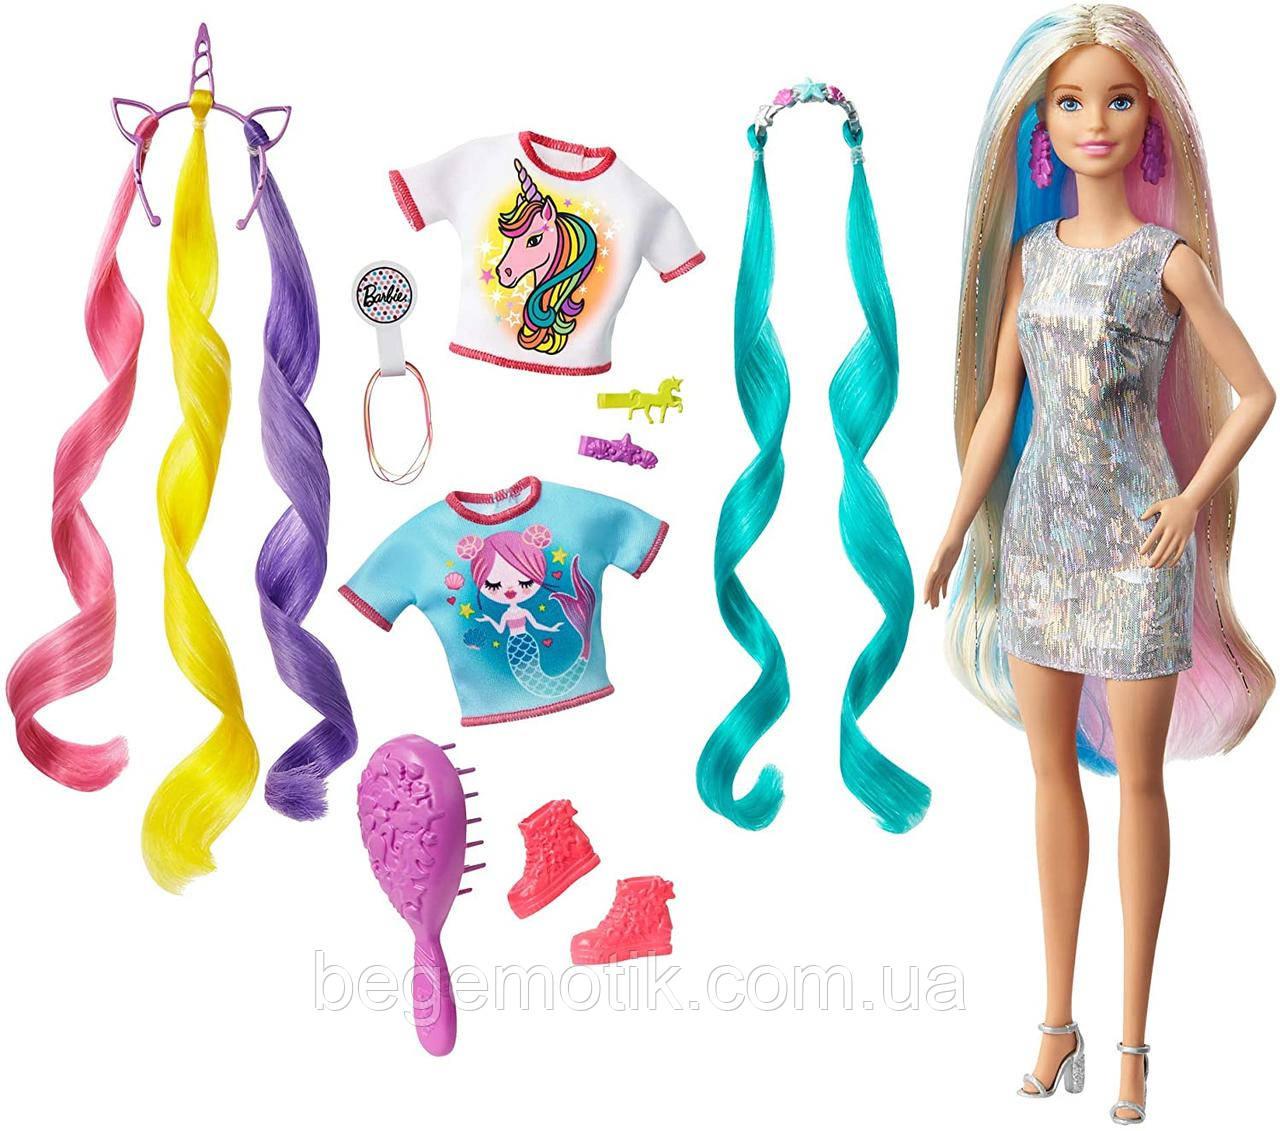 Barbie Кукла Барби - единорог и русалка Фантазийные образы - Barbie GHN04 Fantasy Hair блондинка